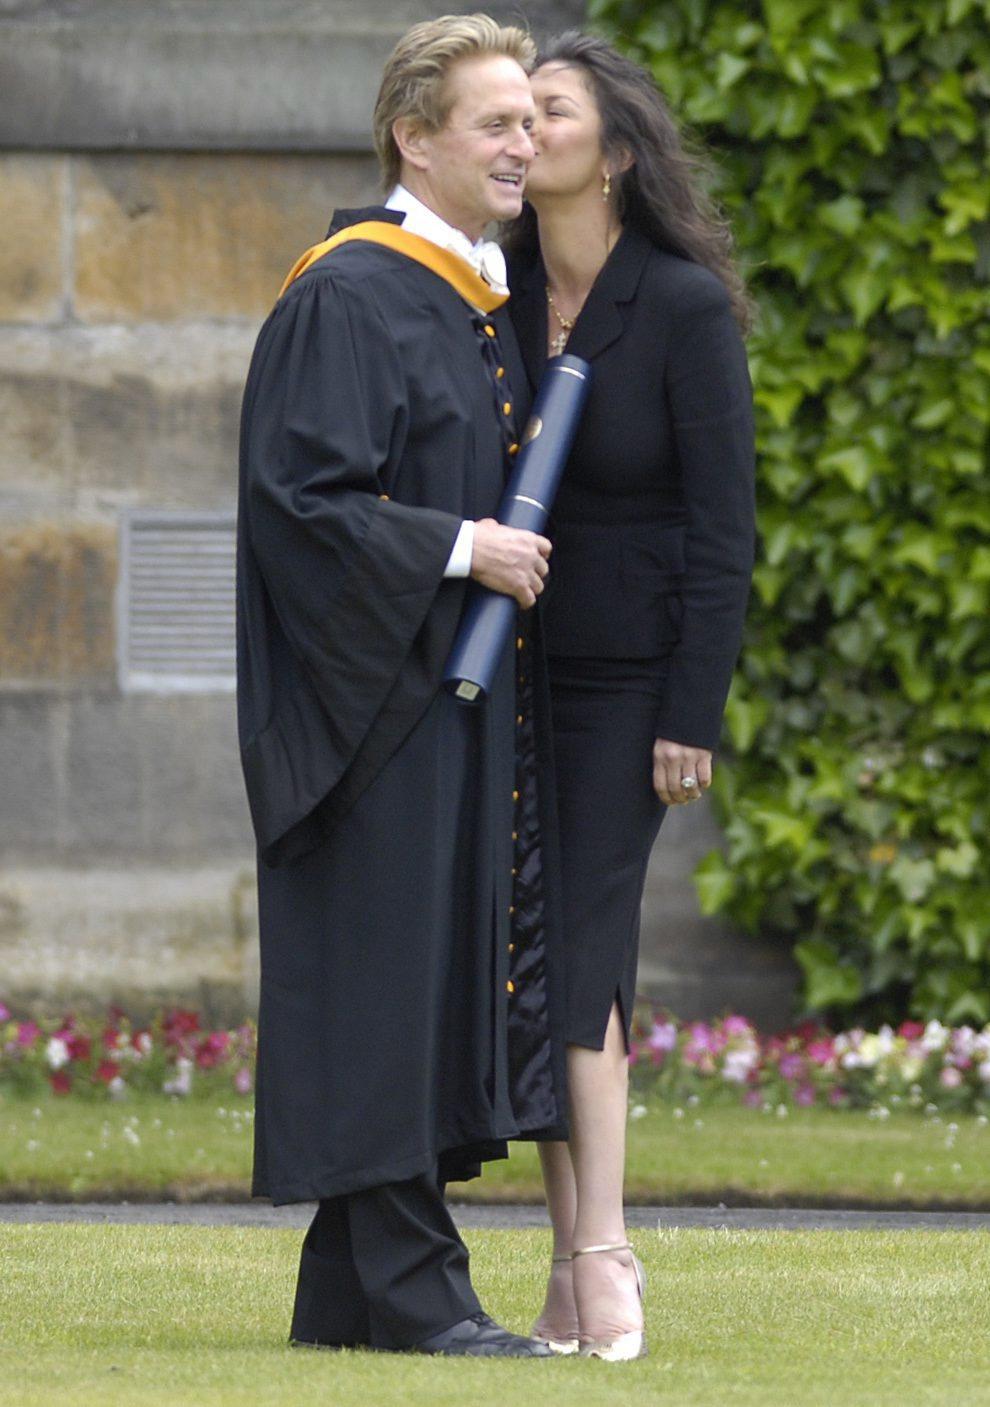 Catherine Zeta Jones kisses Michael Douglas